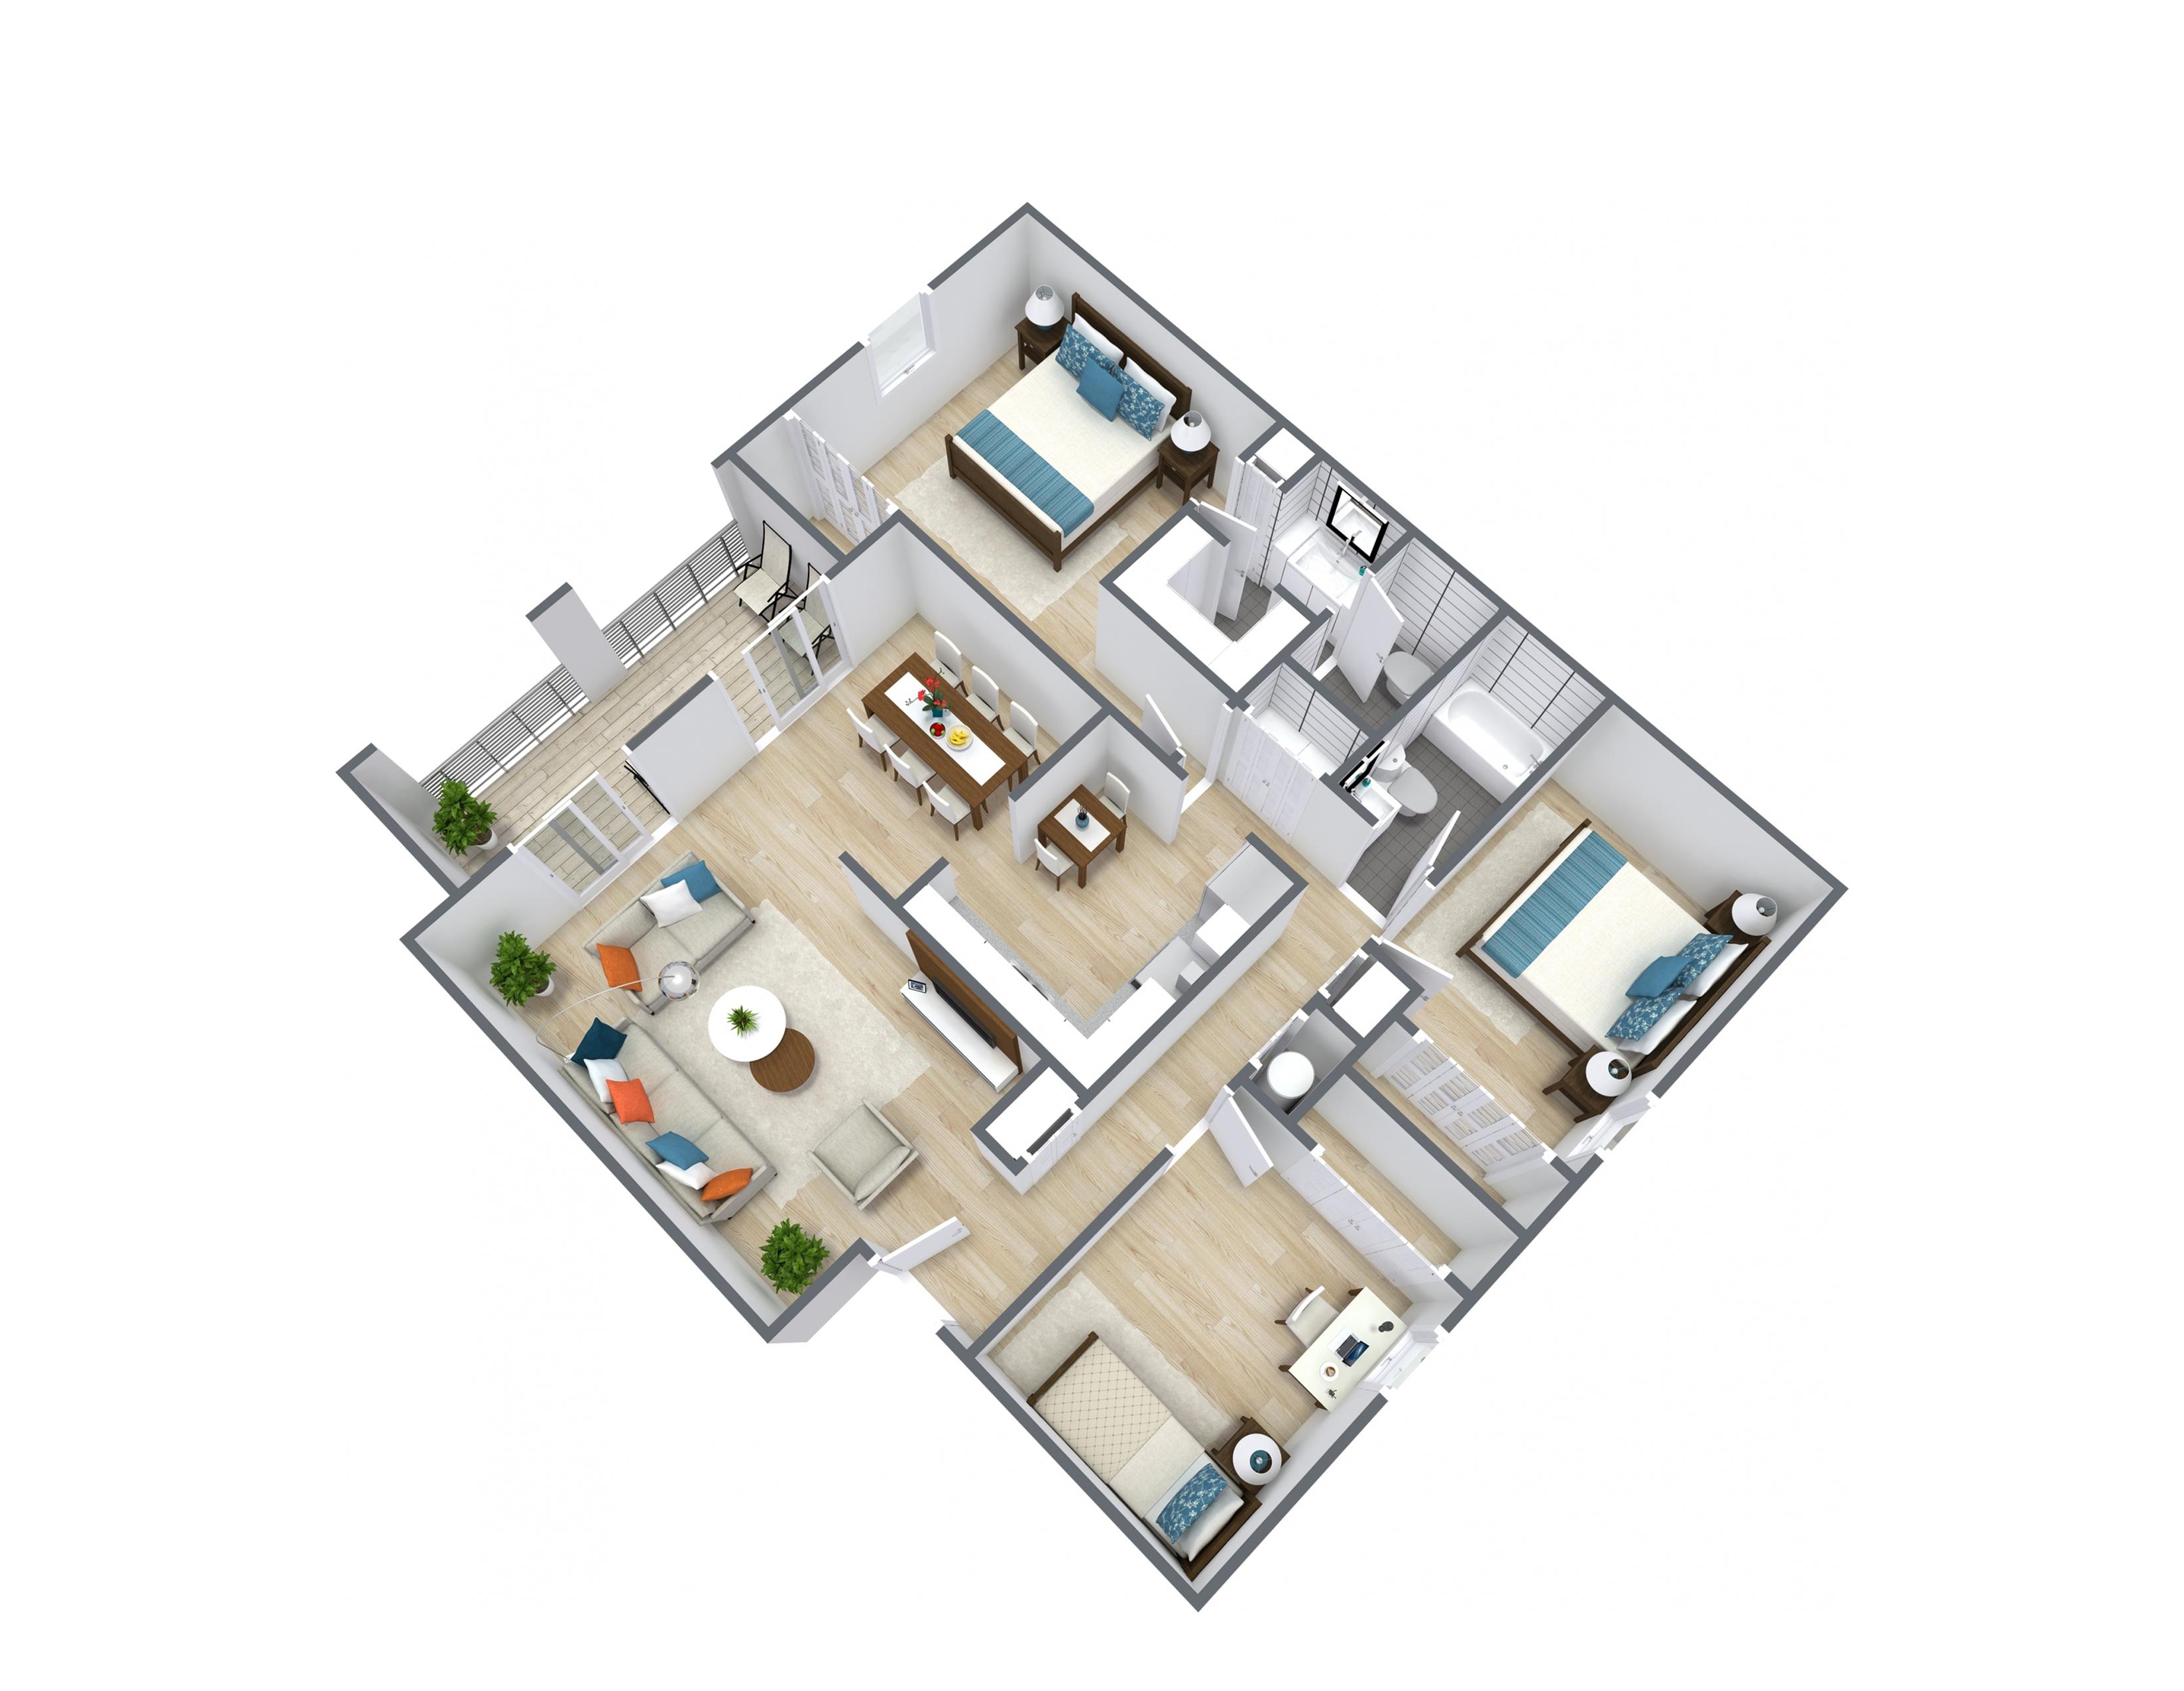 3x2 Floor Plan Layout